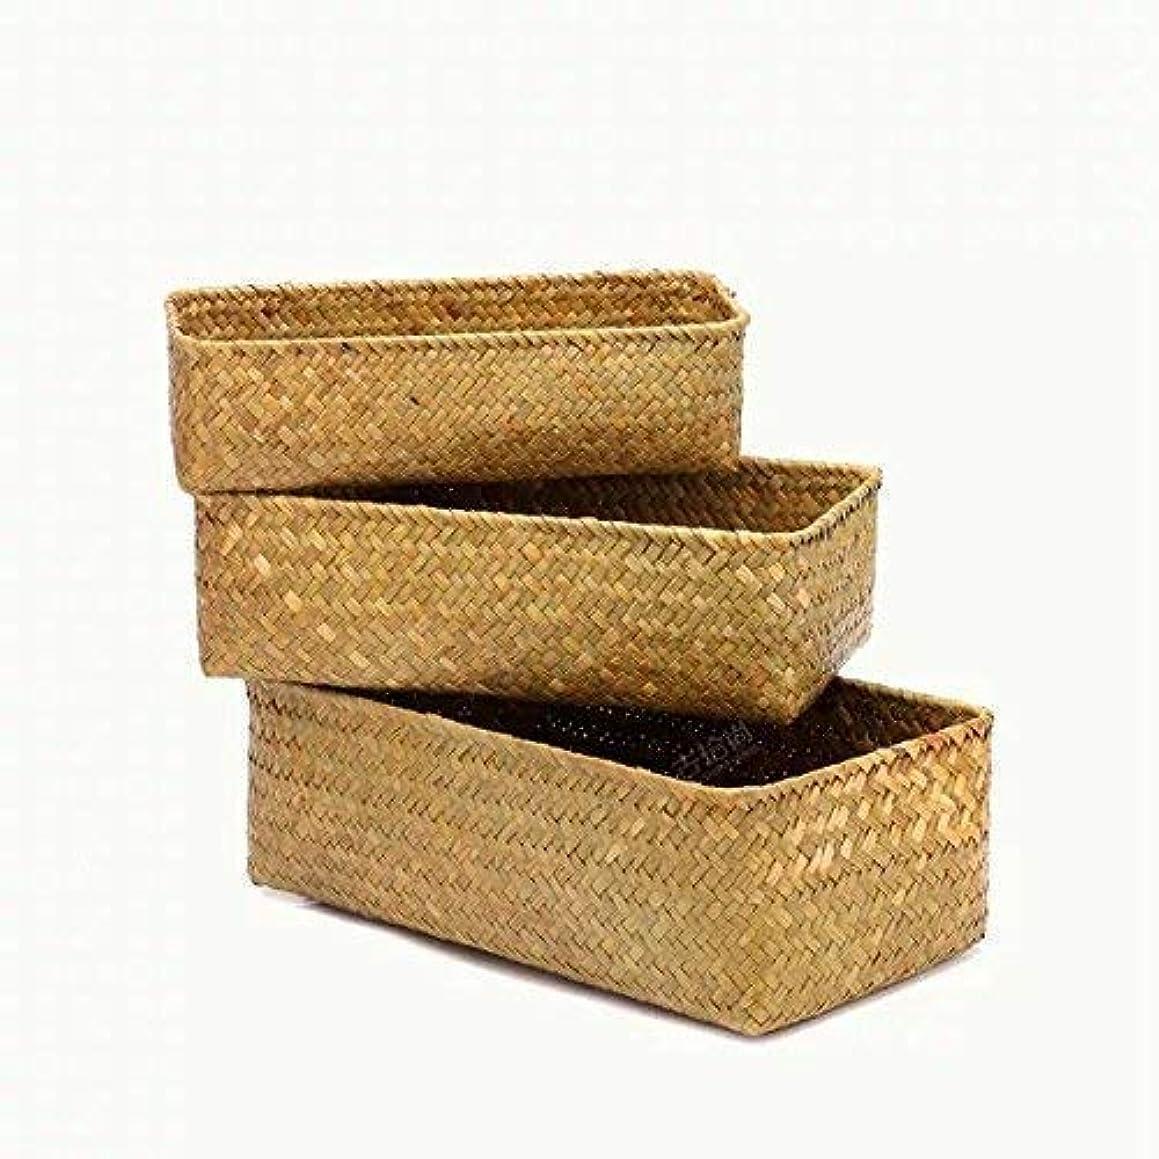 3-Pack Hand-Woven Water Hyacinth Baskets, Wicker Storage Basket Set